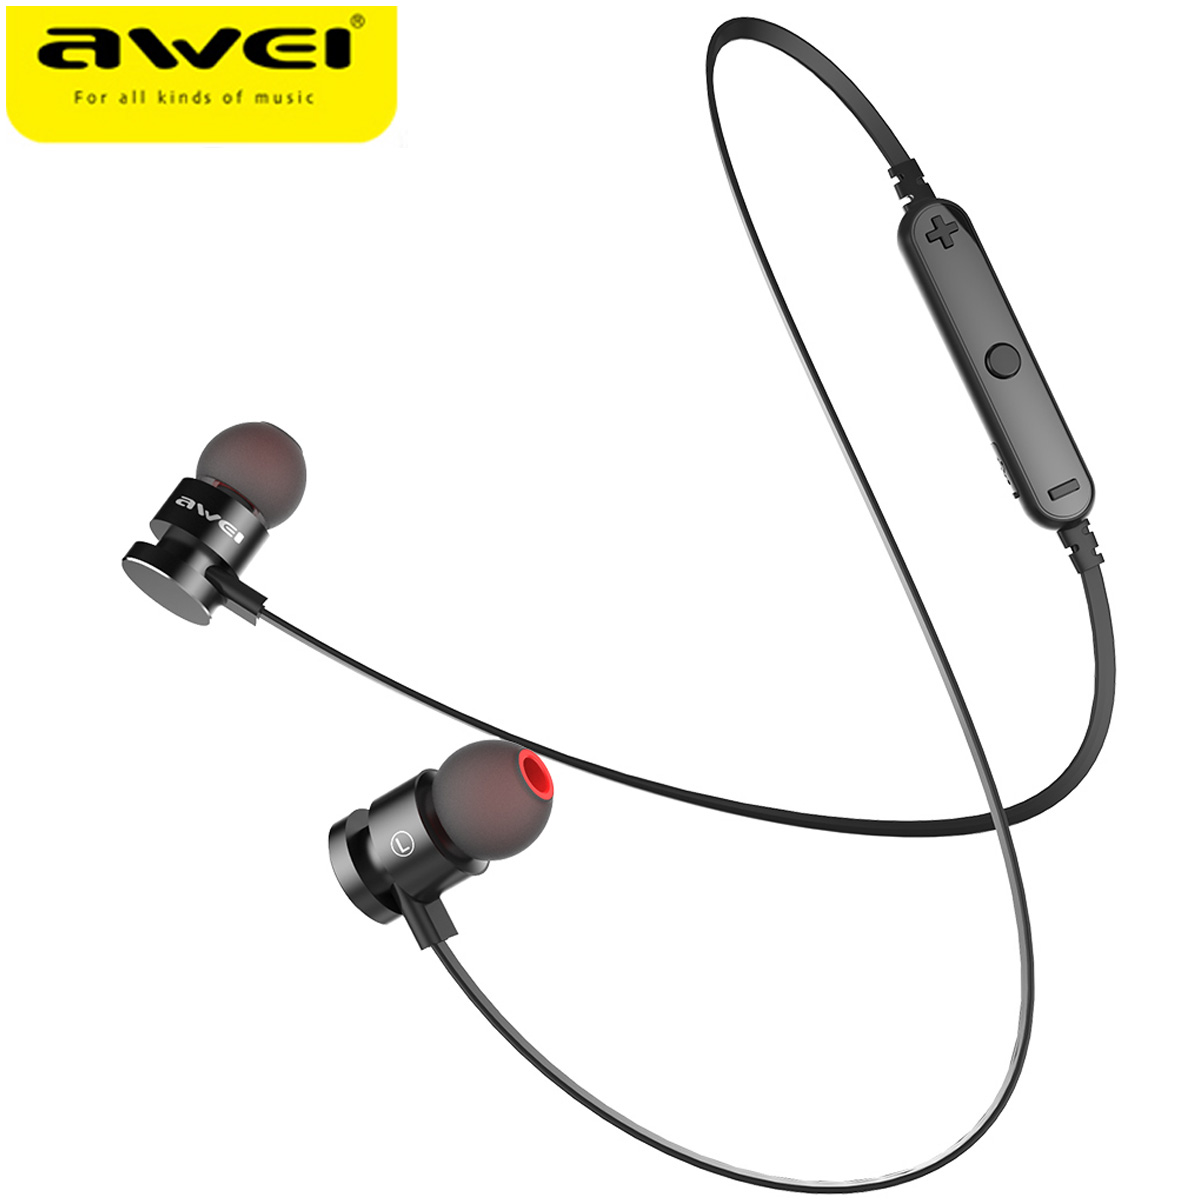 AWEI T11 Wireless Headphone Bluetooth Earphone Fone de ouvido For Phone Kulakl k Neckband Ecouteur Auriculares Bluetooth V4.2